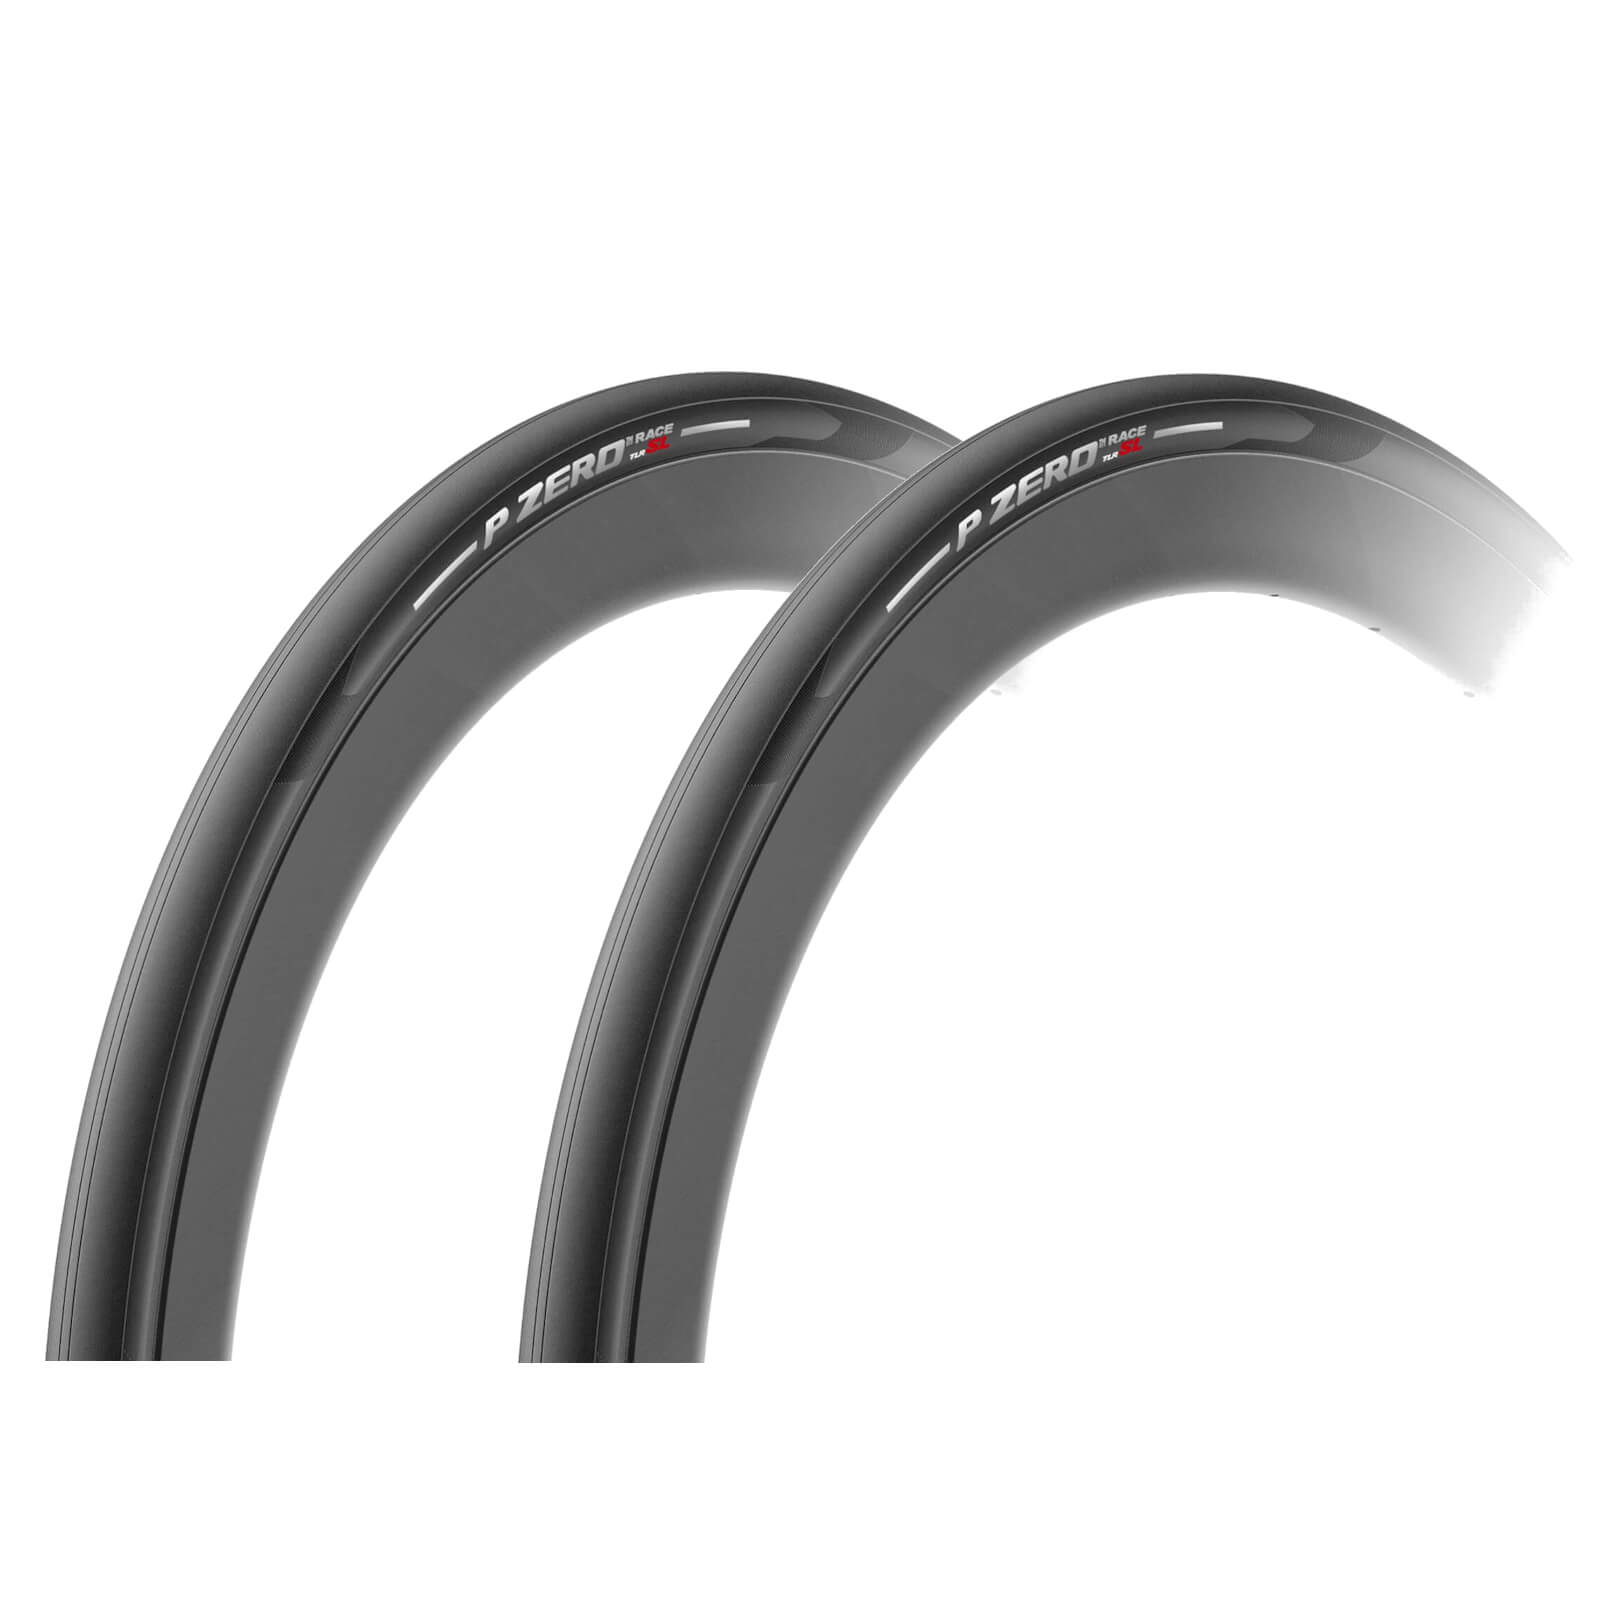 Pirelli P-Zero Race SL Tubeless Ready Clincher Road Tyre Twin Pack - 700 x 24mm